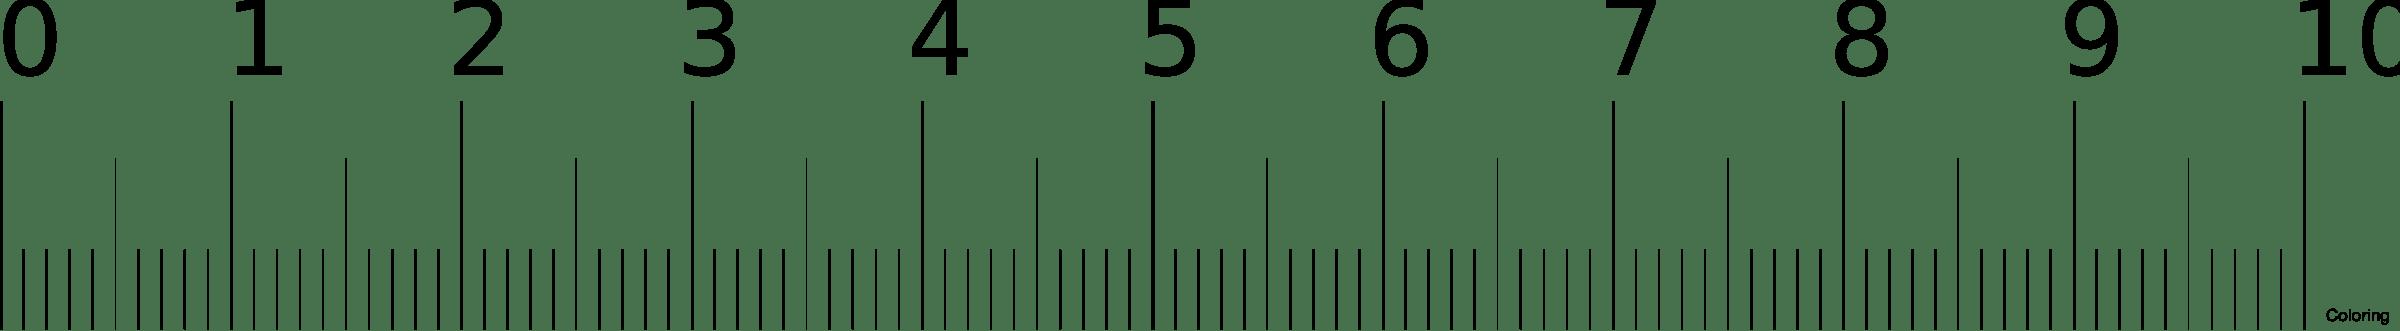 Clipart ruler metre ruler. Cm cliparts free download